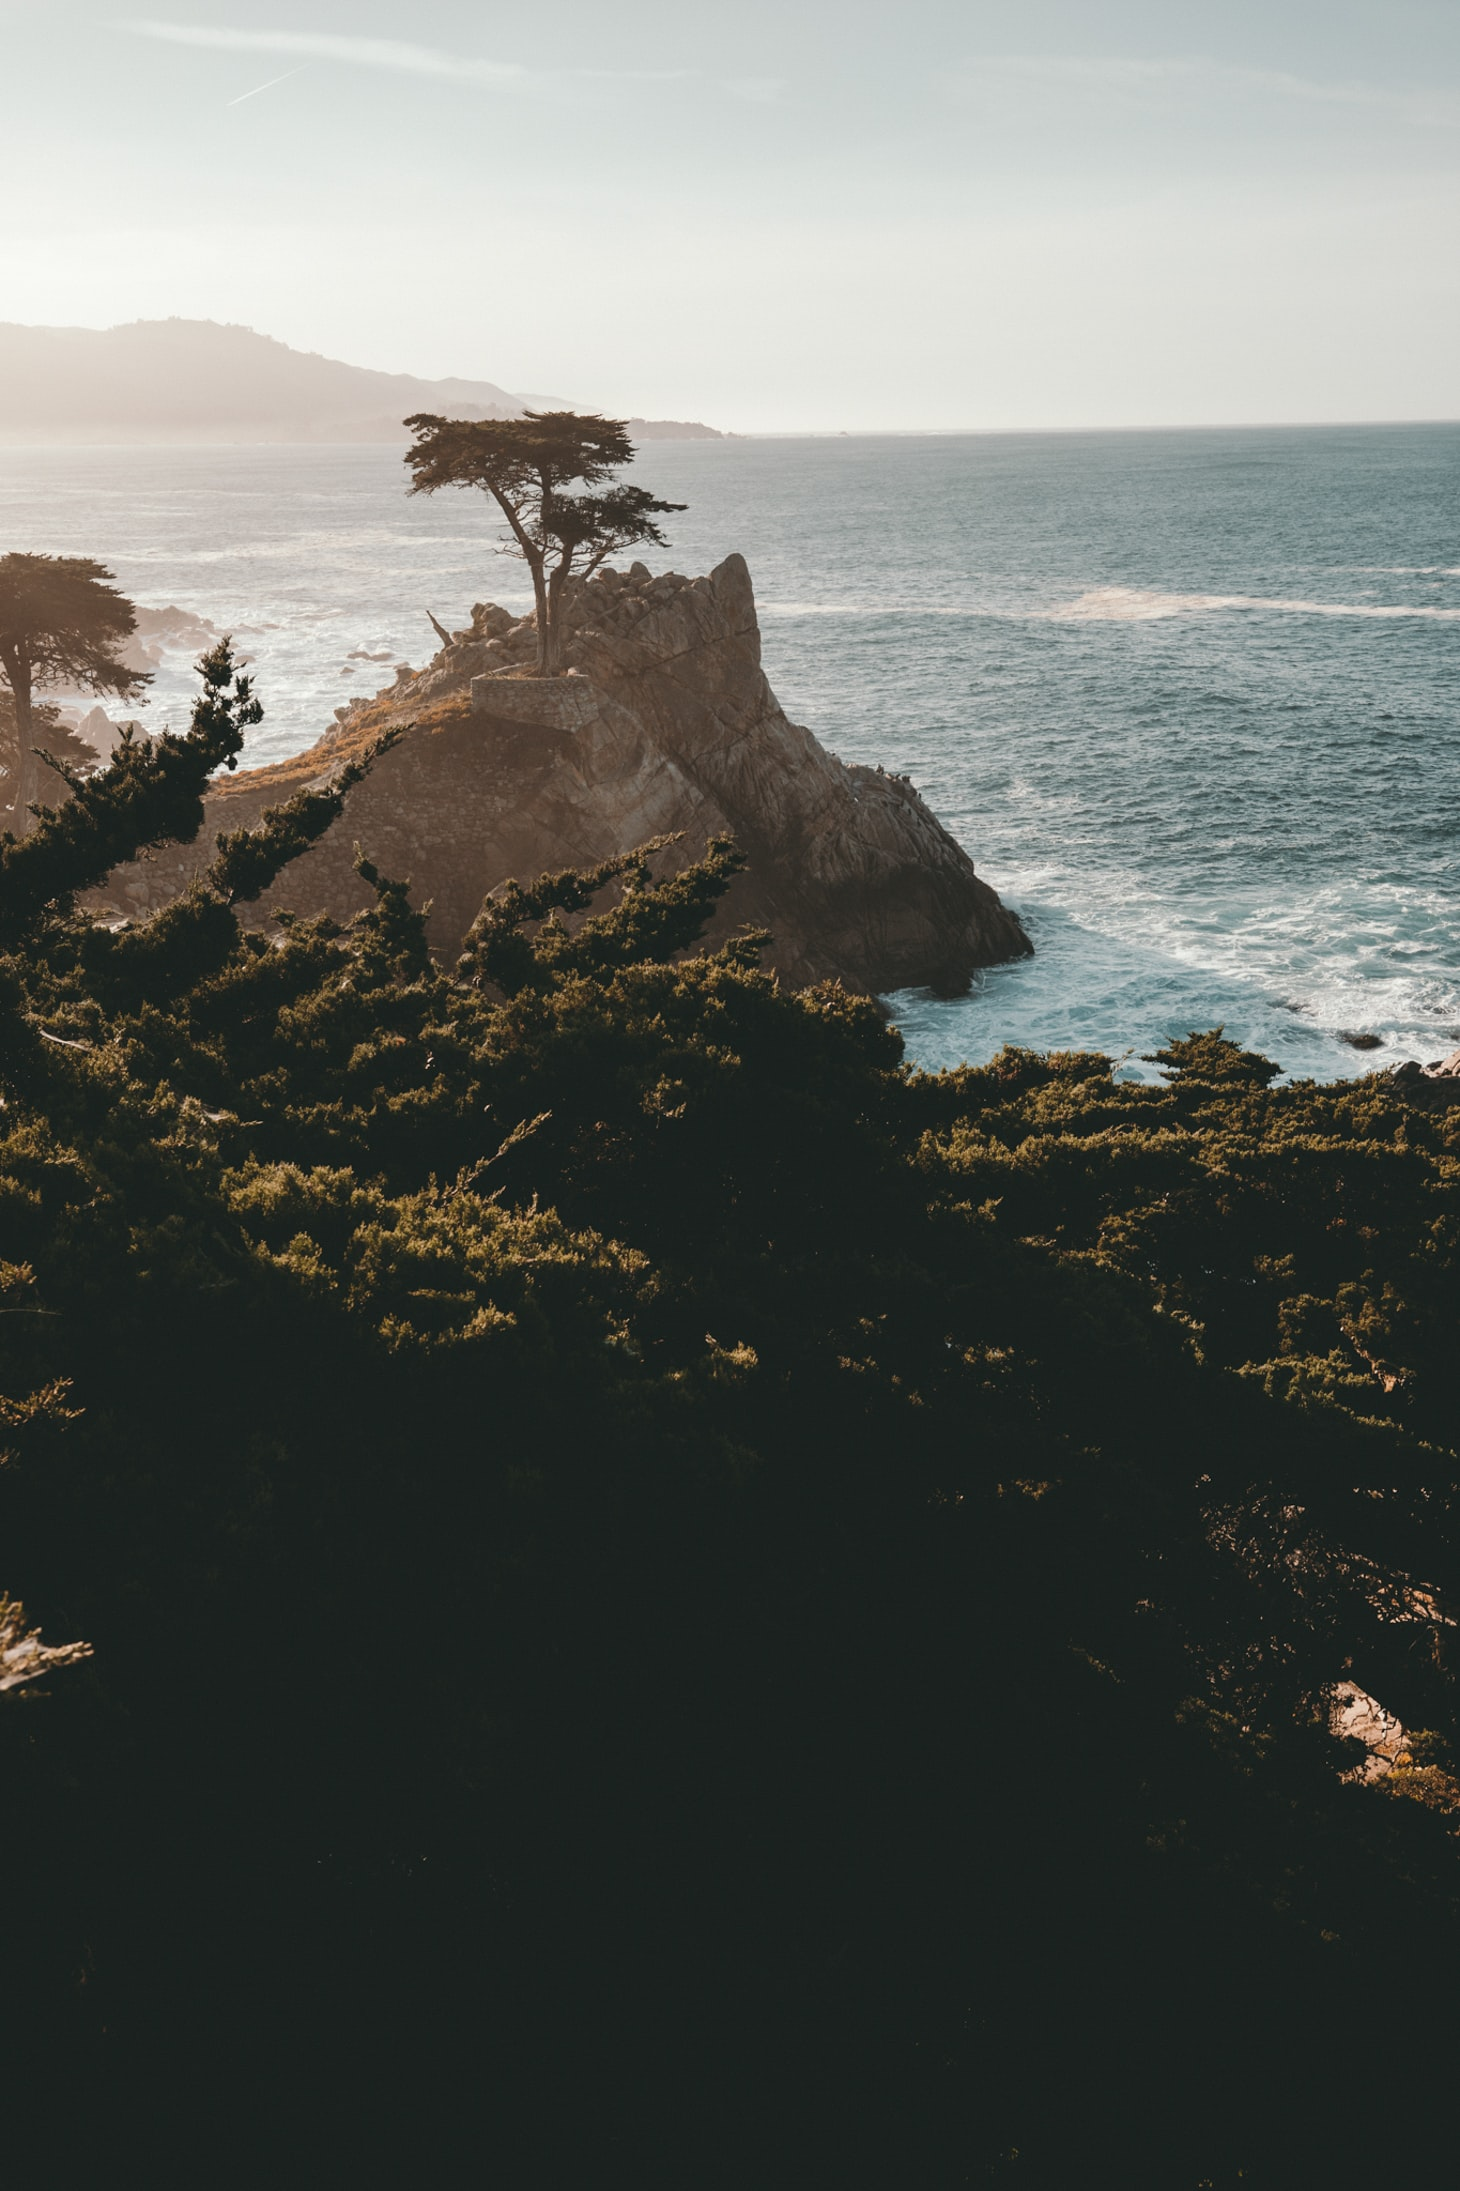 tree on cliff beside sea